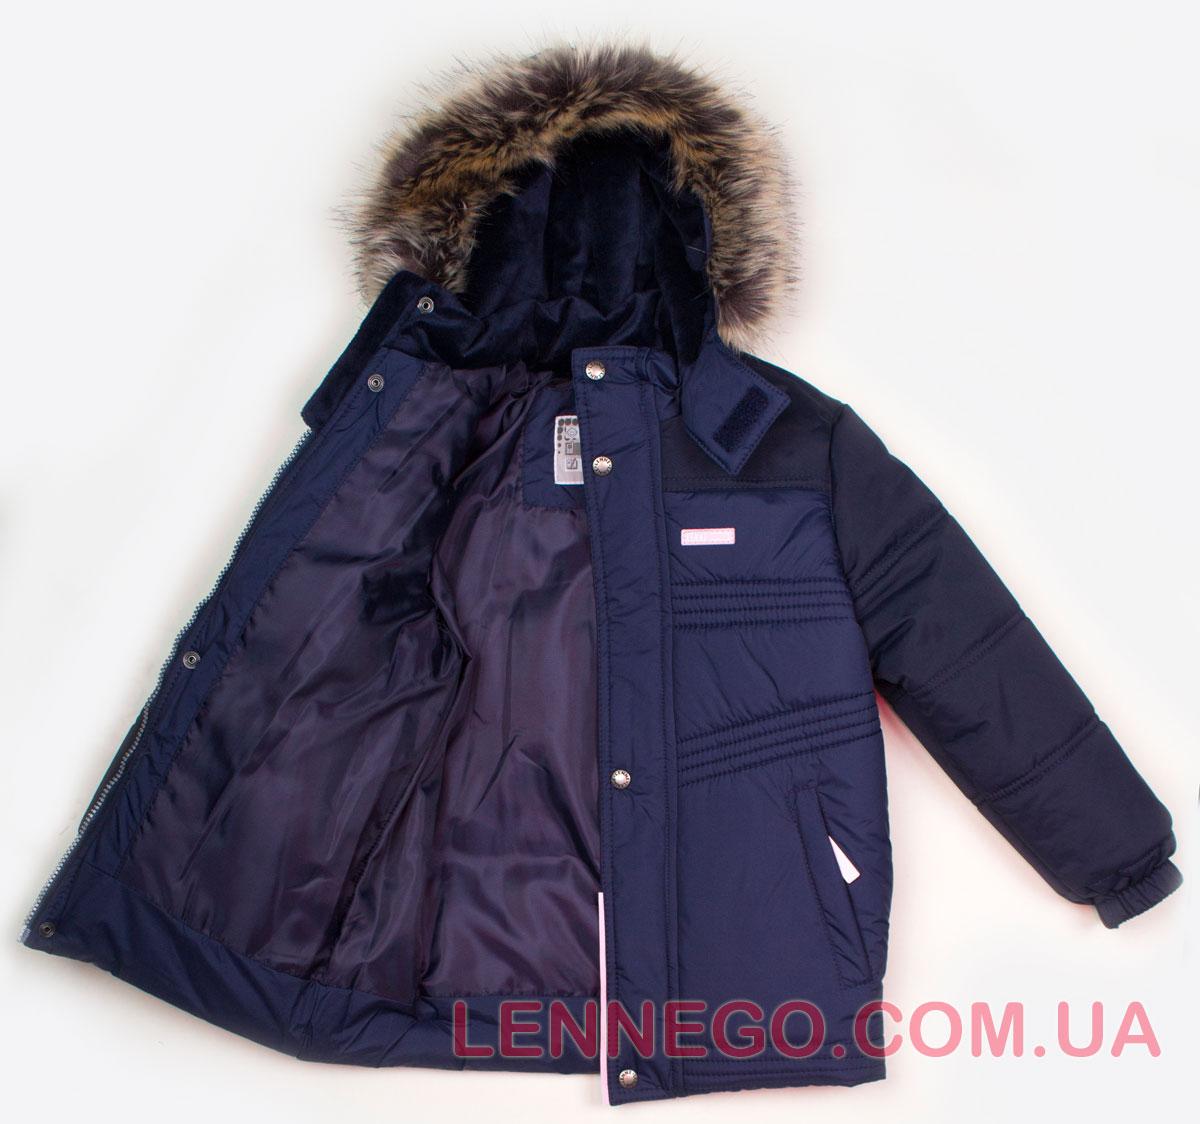 Lenne Milo куртка для мальчика синяя